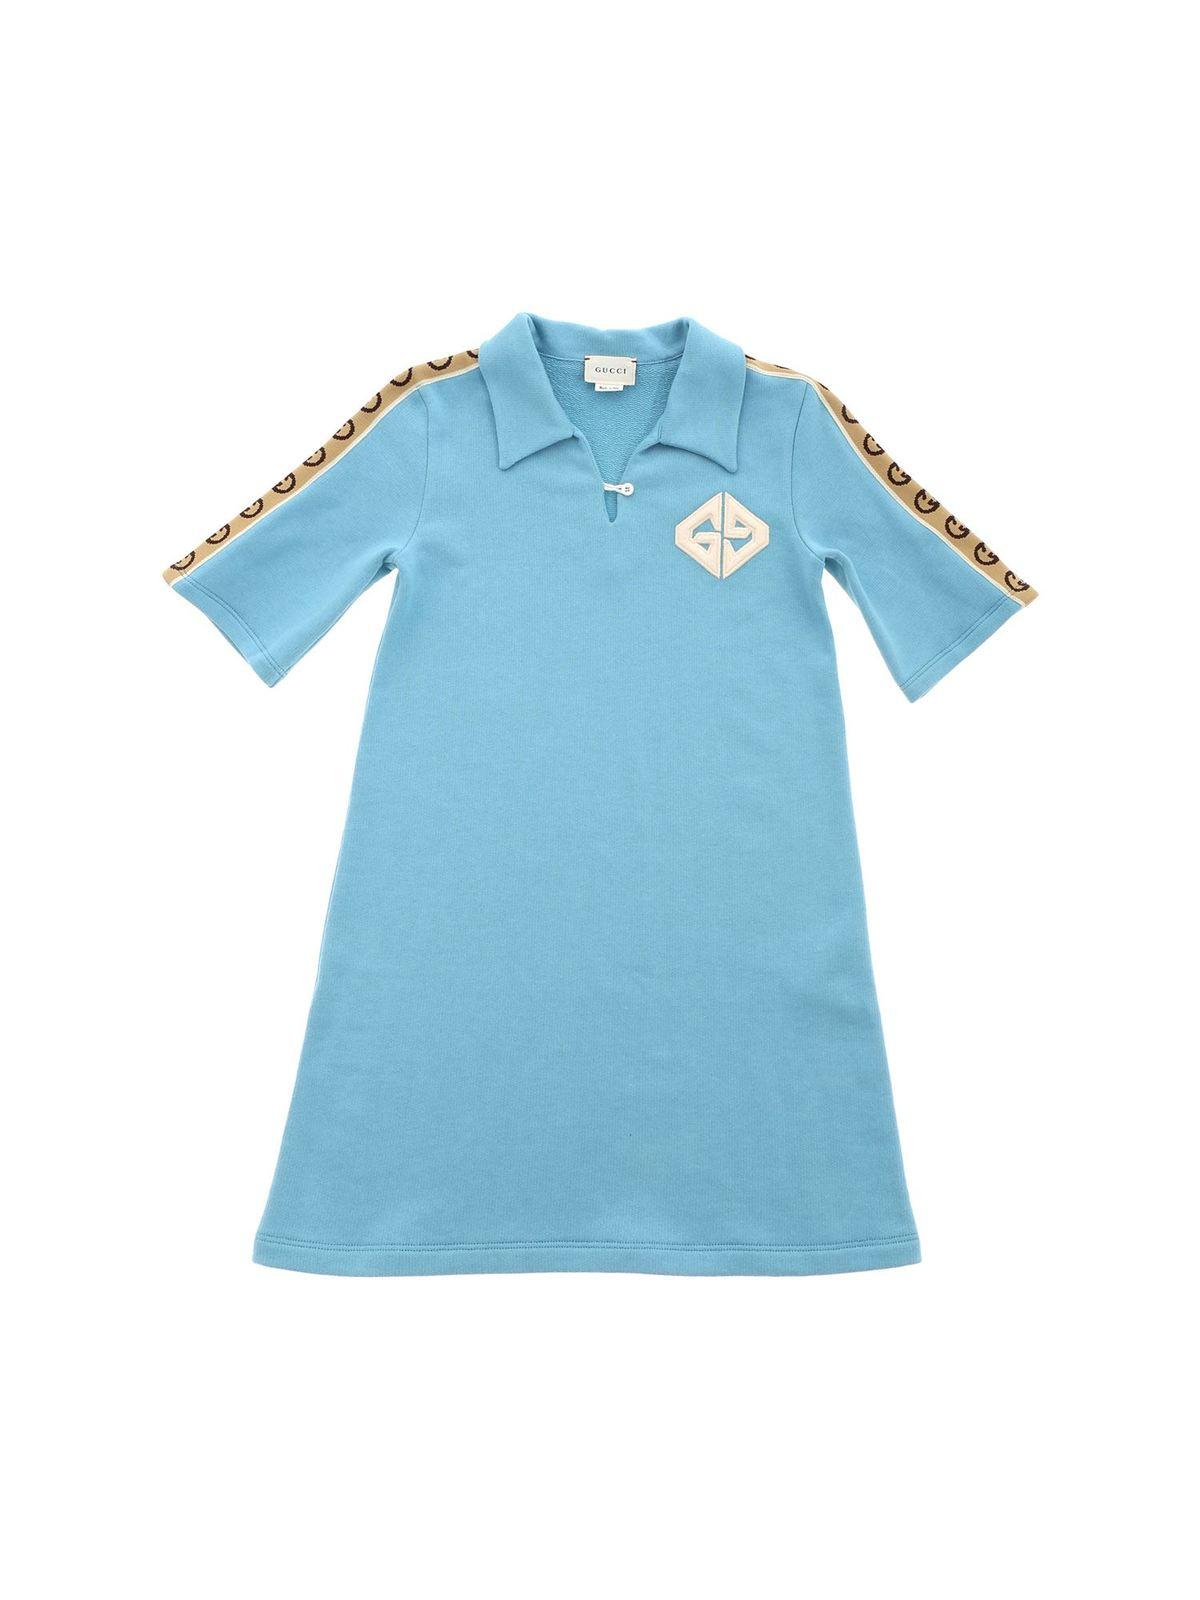 Fendi Jr Cottons GG COTTON DRESS IN LIGHT BLUE